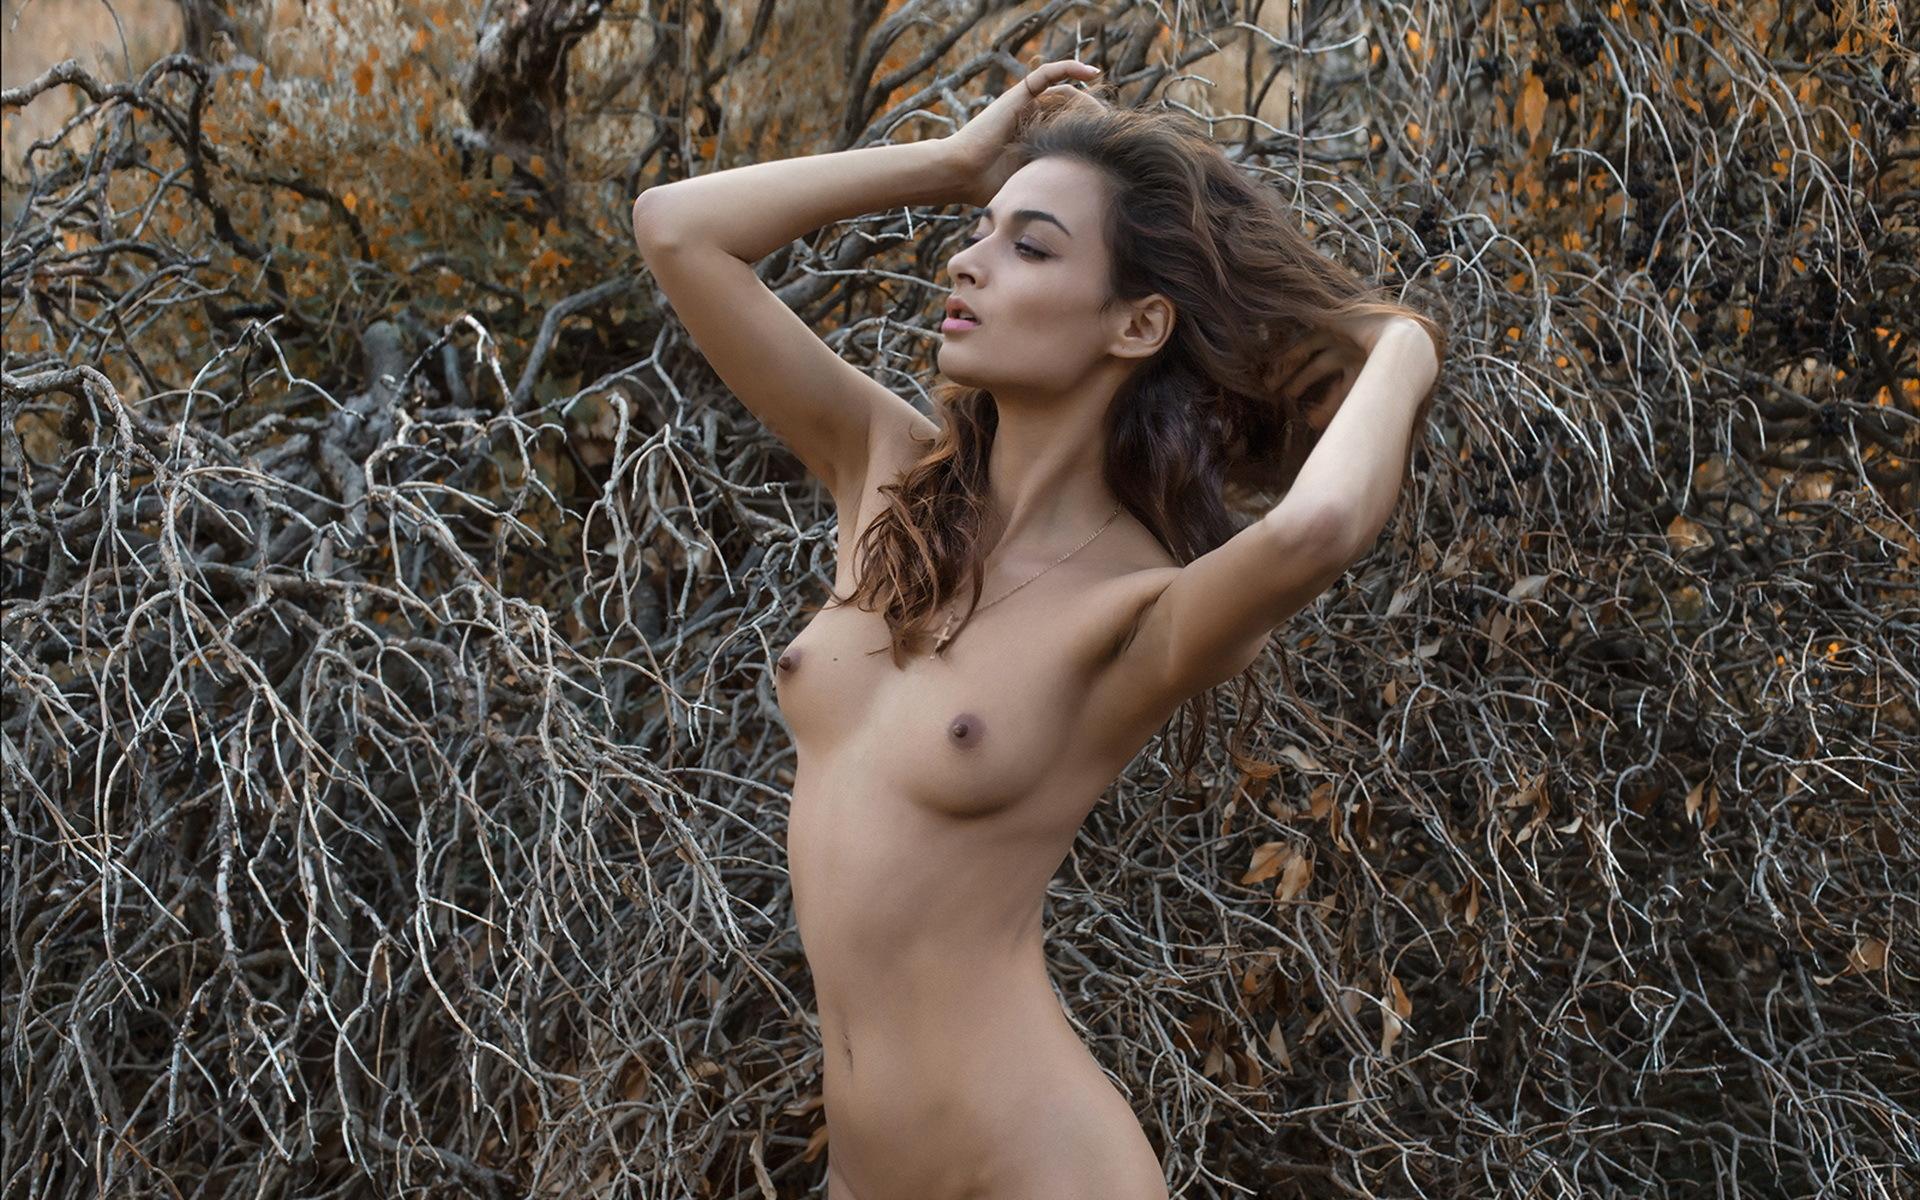 Craig italian nud girl woman skinny